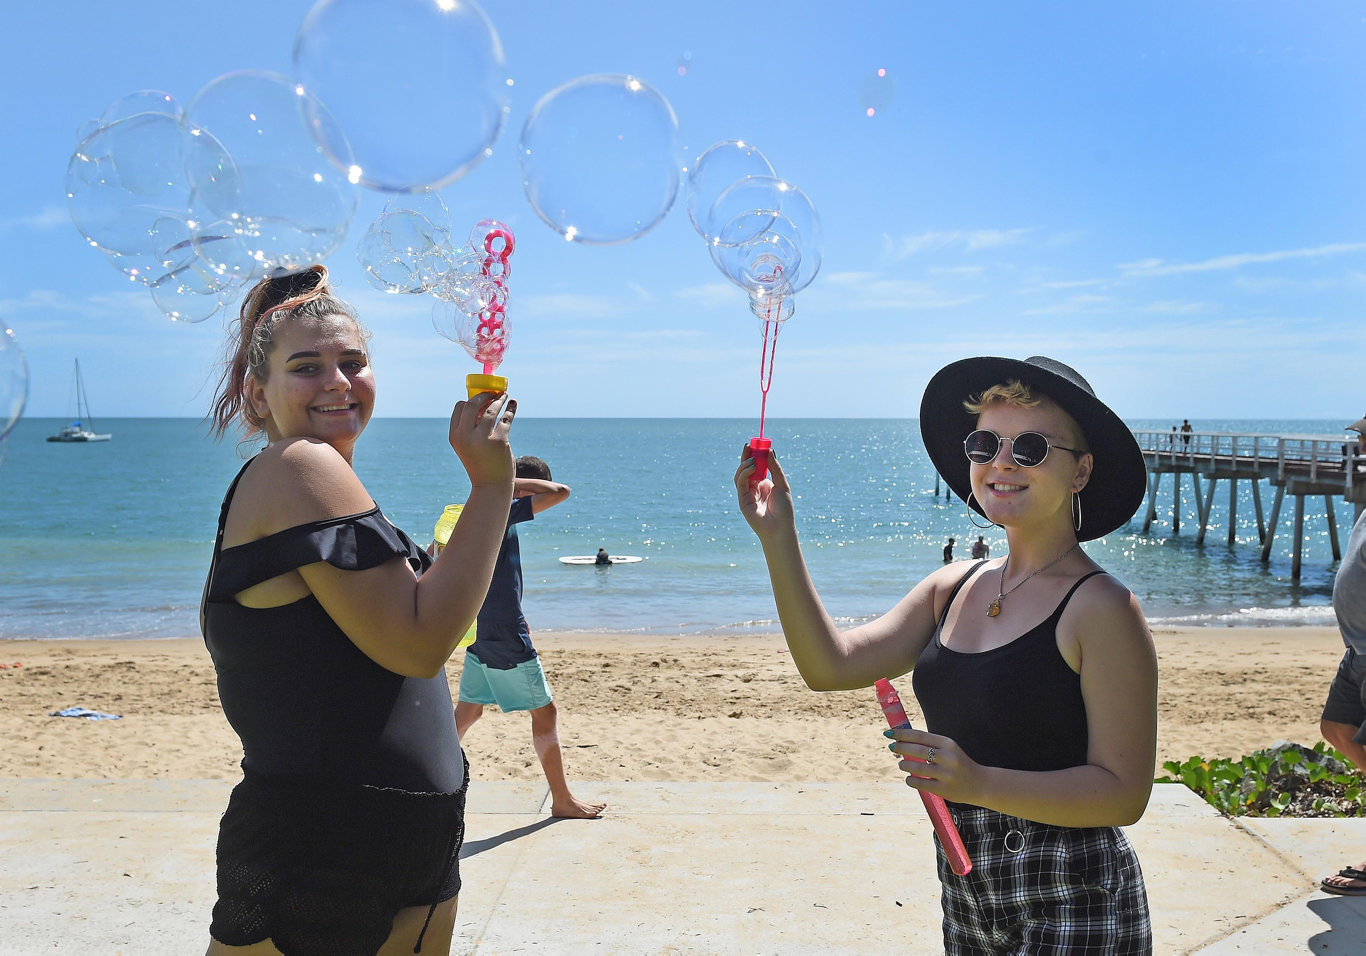 Youth week Red Cross beach day - 16yo Hayley Howard and 17yo Portia Robertson.